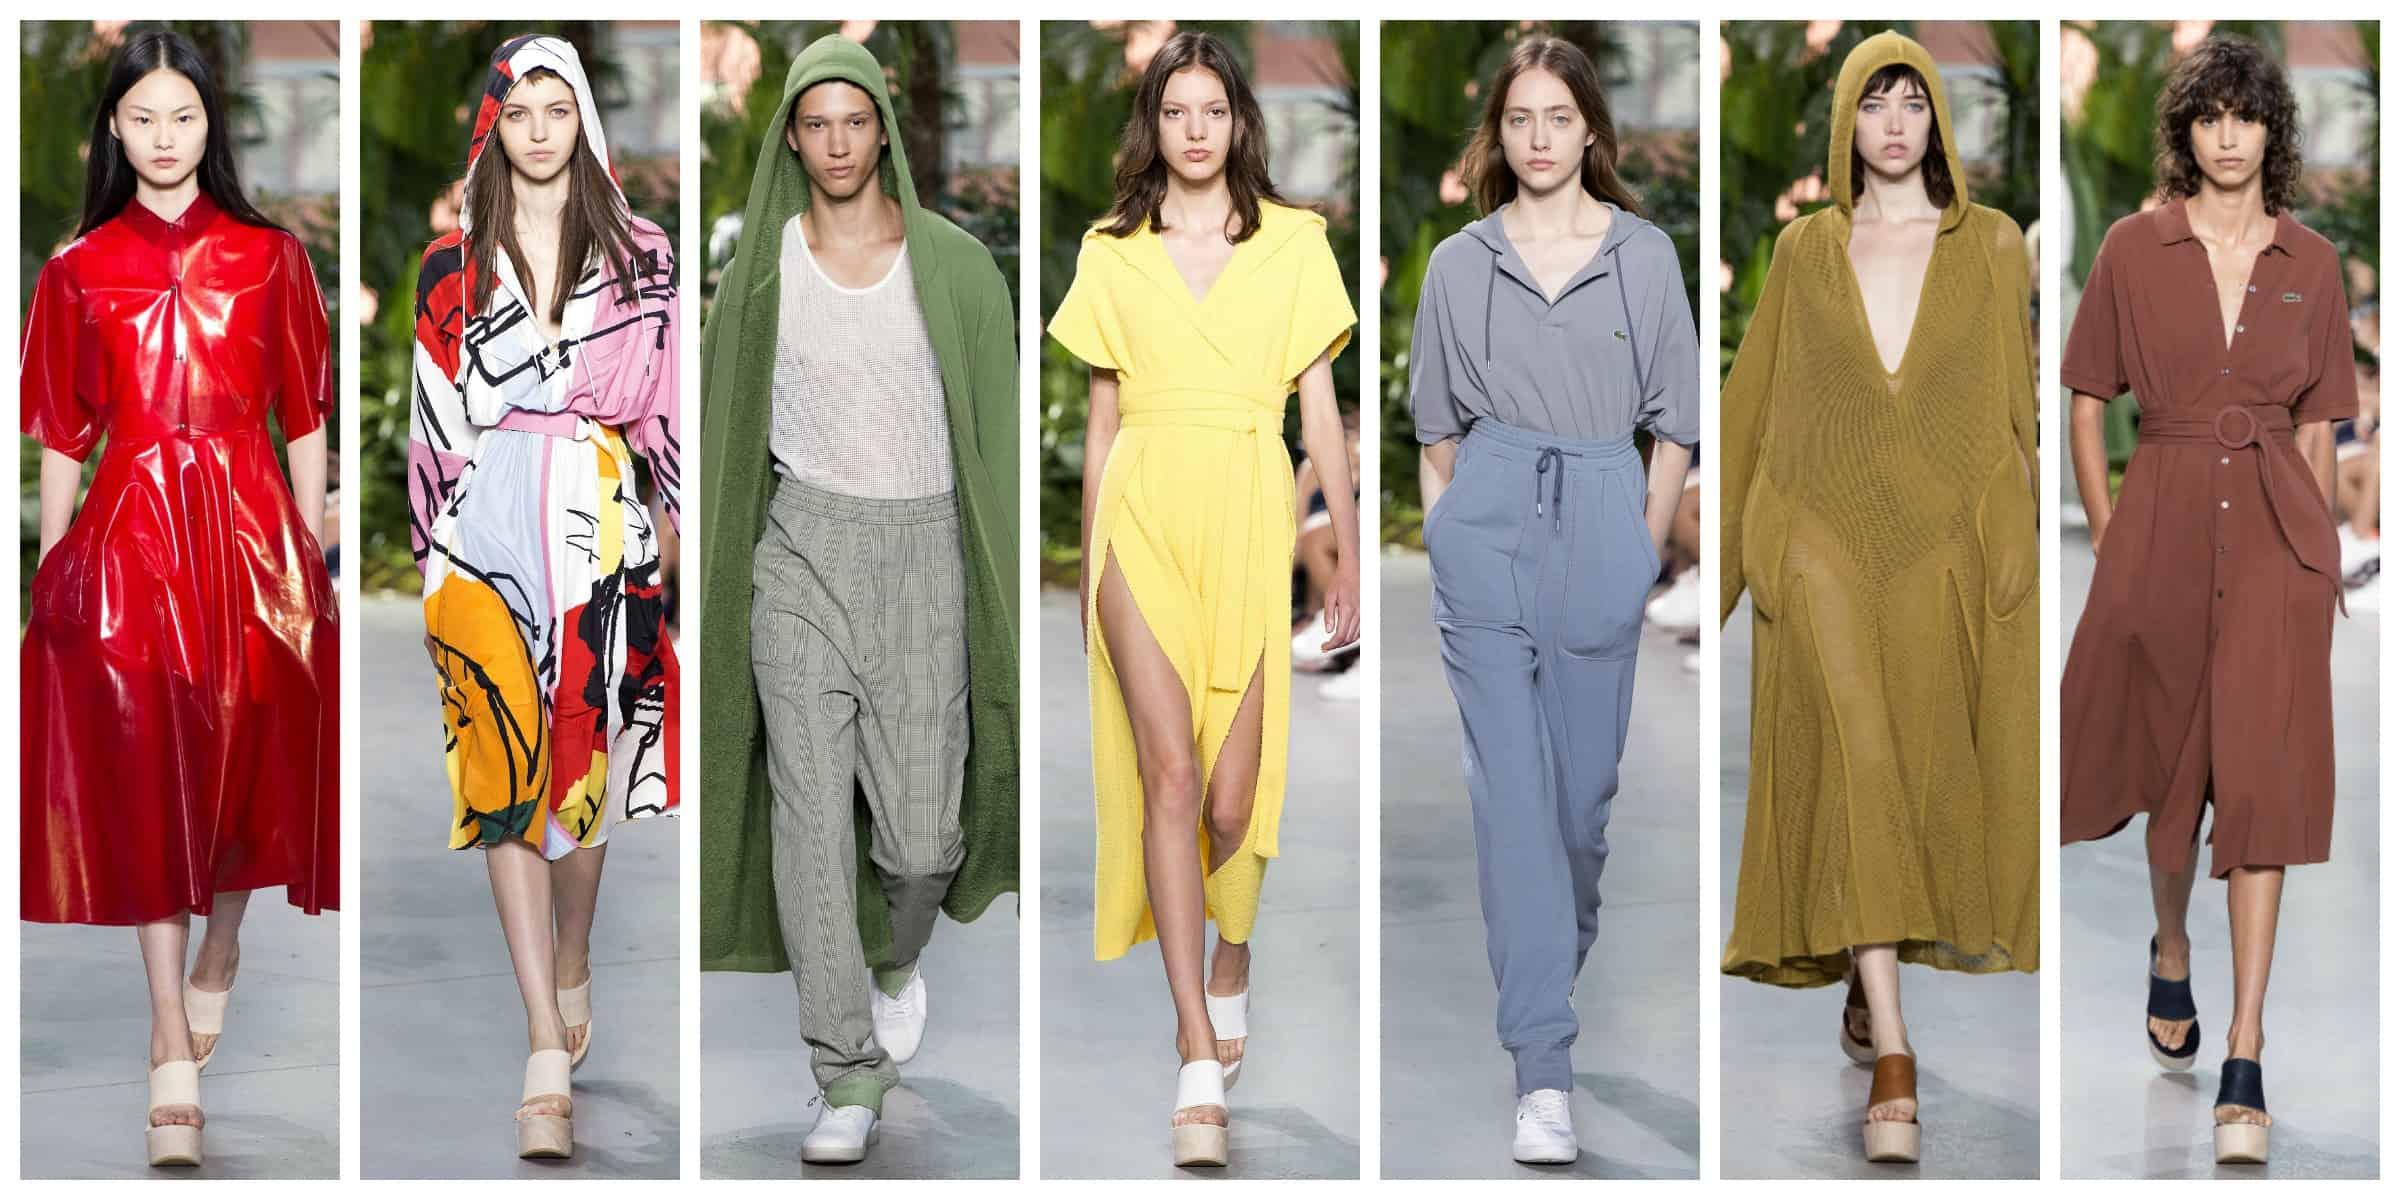 New York Fashion Week Spring 2017 - Lacoste